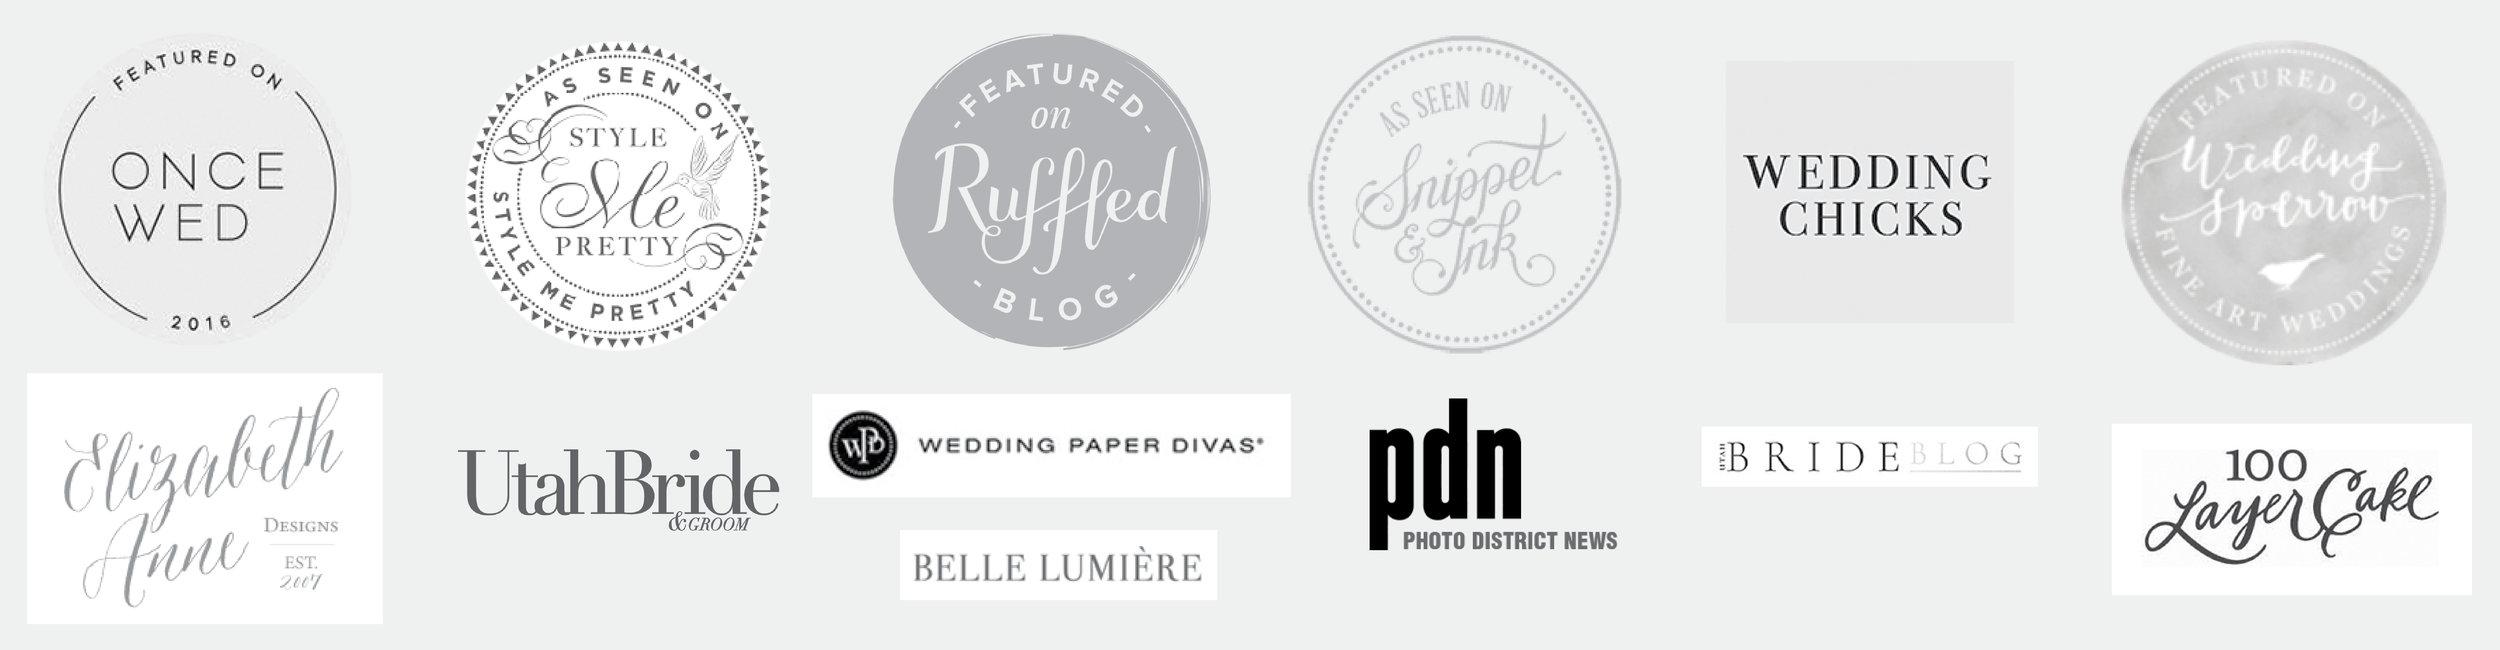 wedding-blog-features-lindsey-stewart